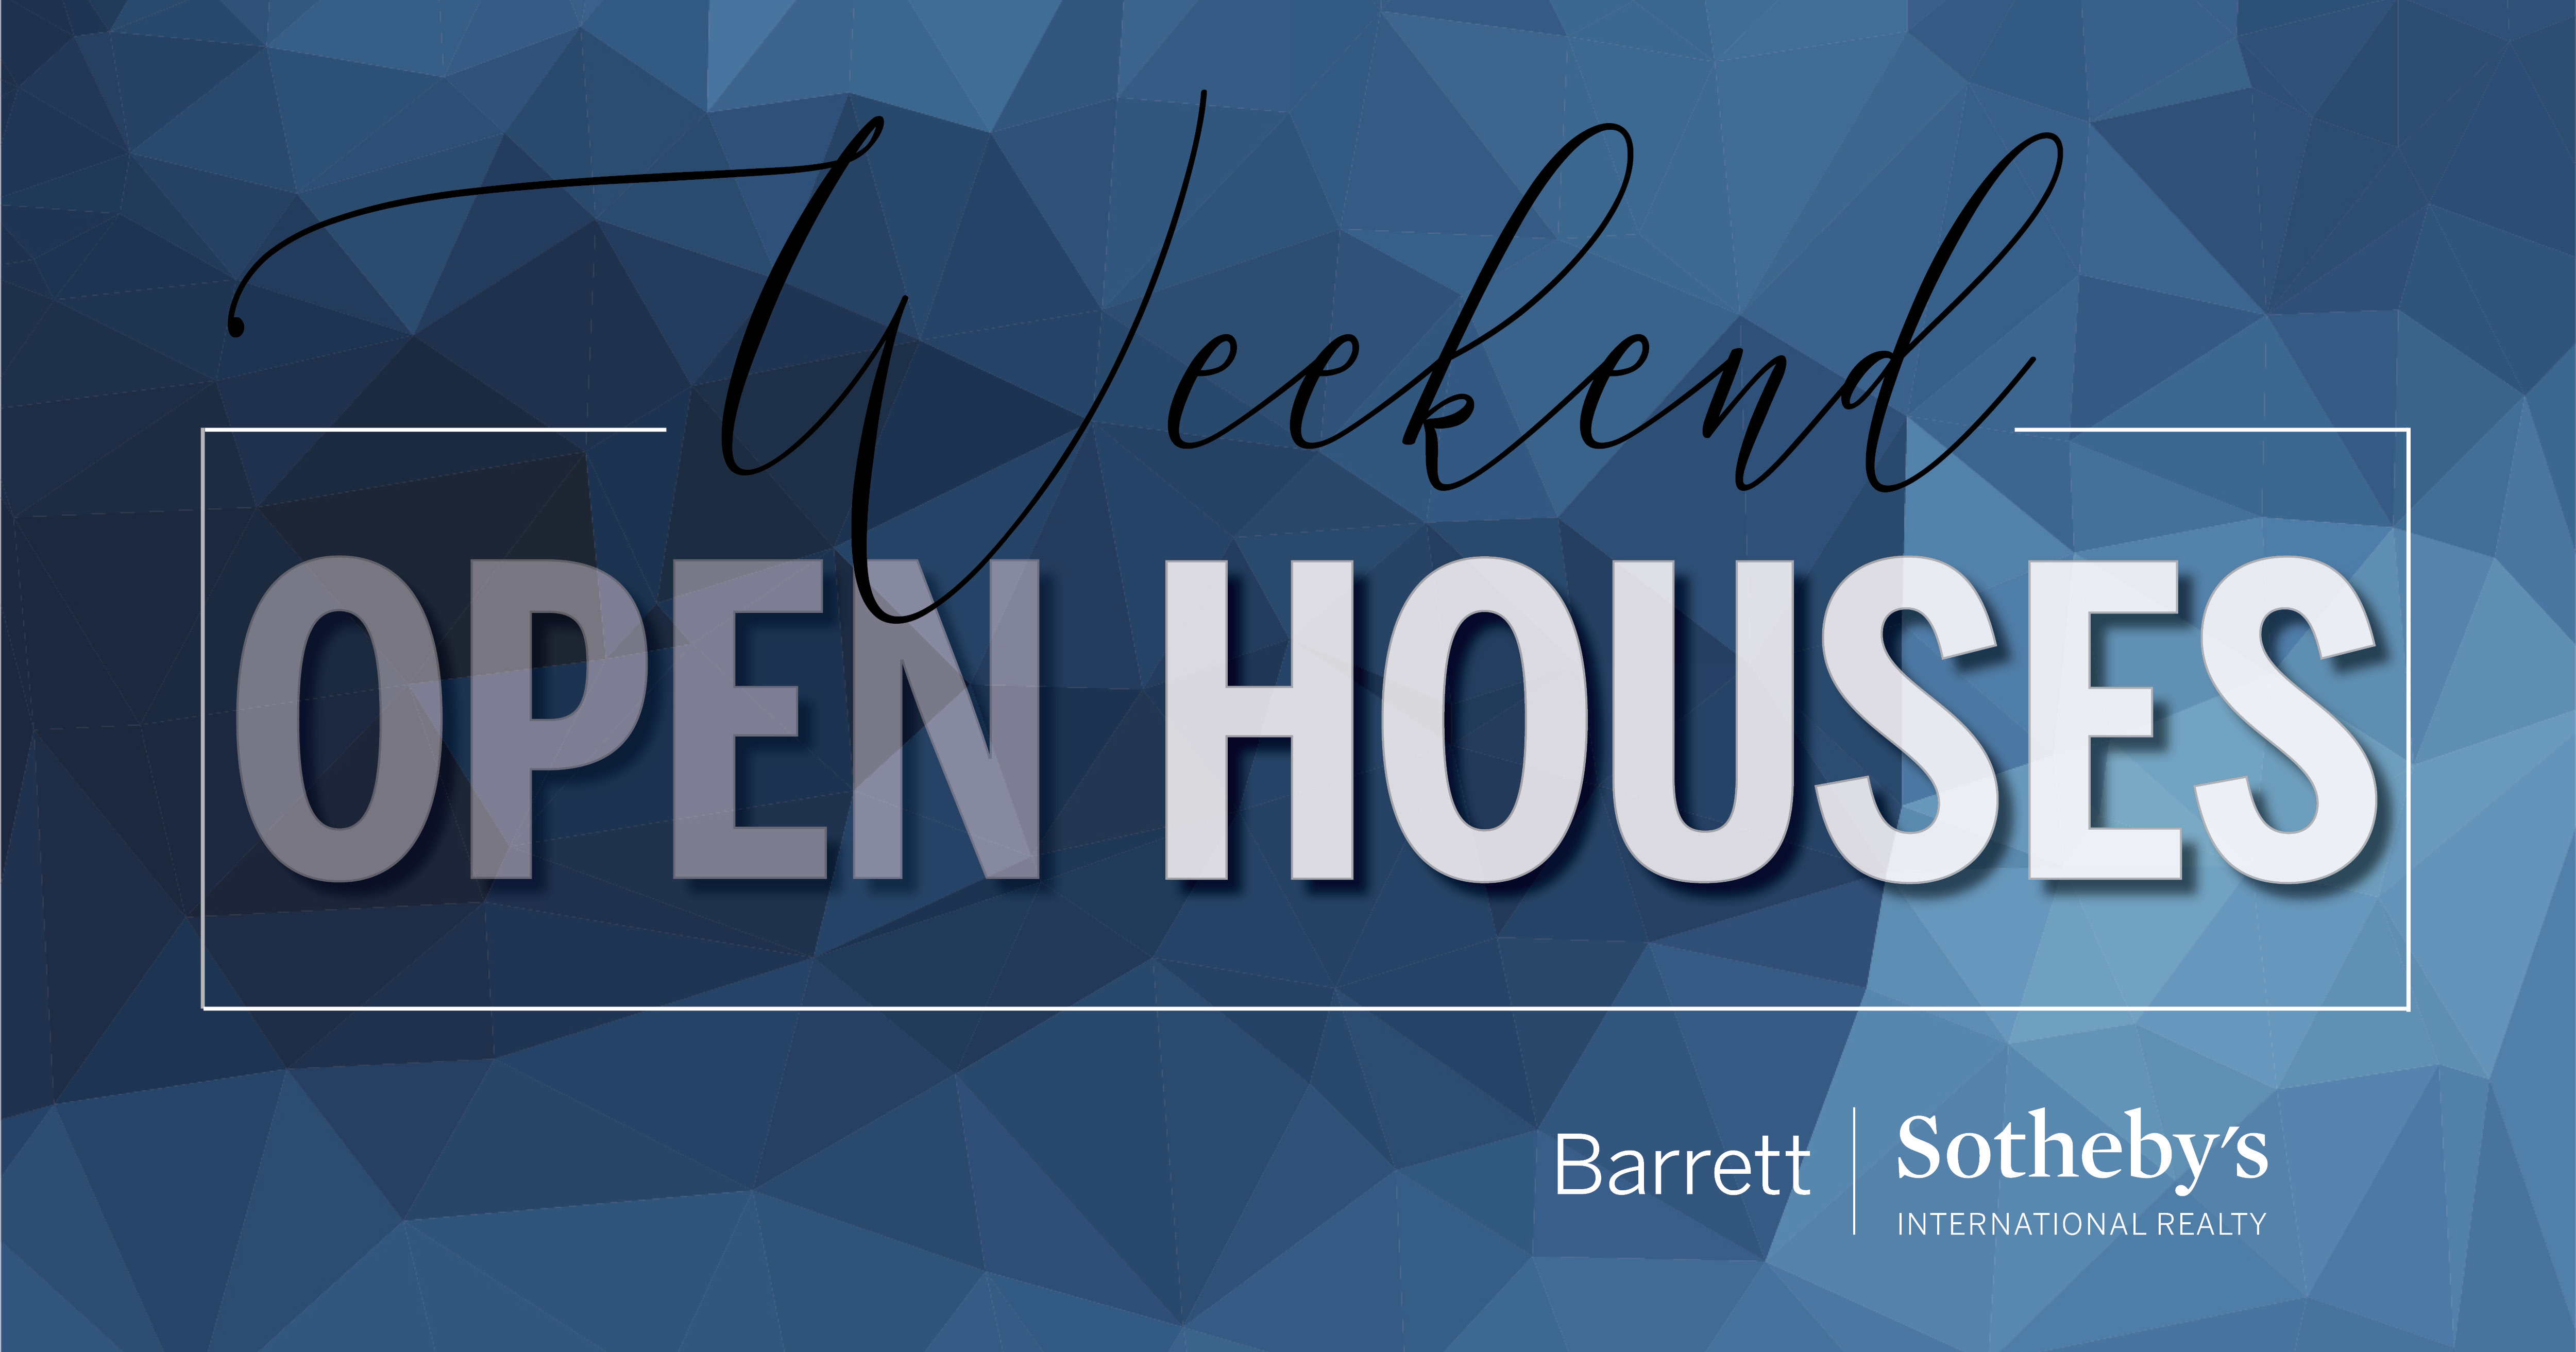 Barrett Sotheby's Open Houses